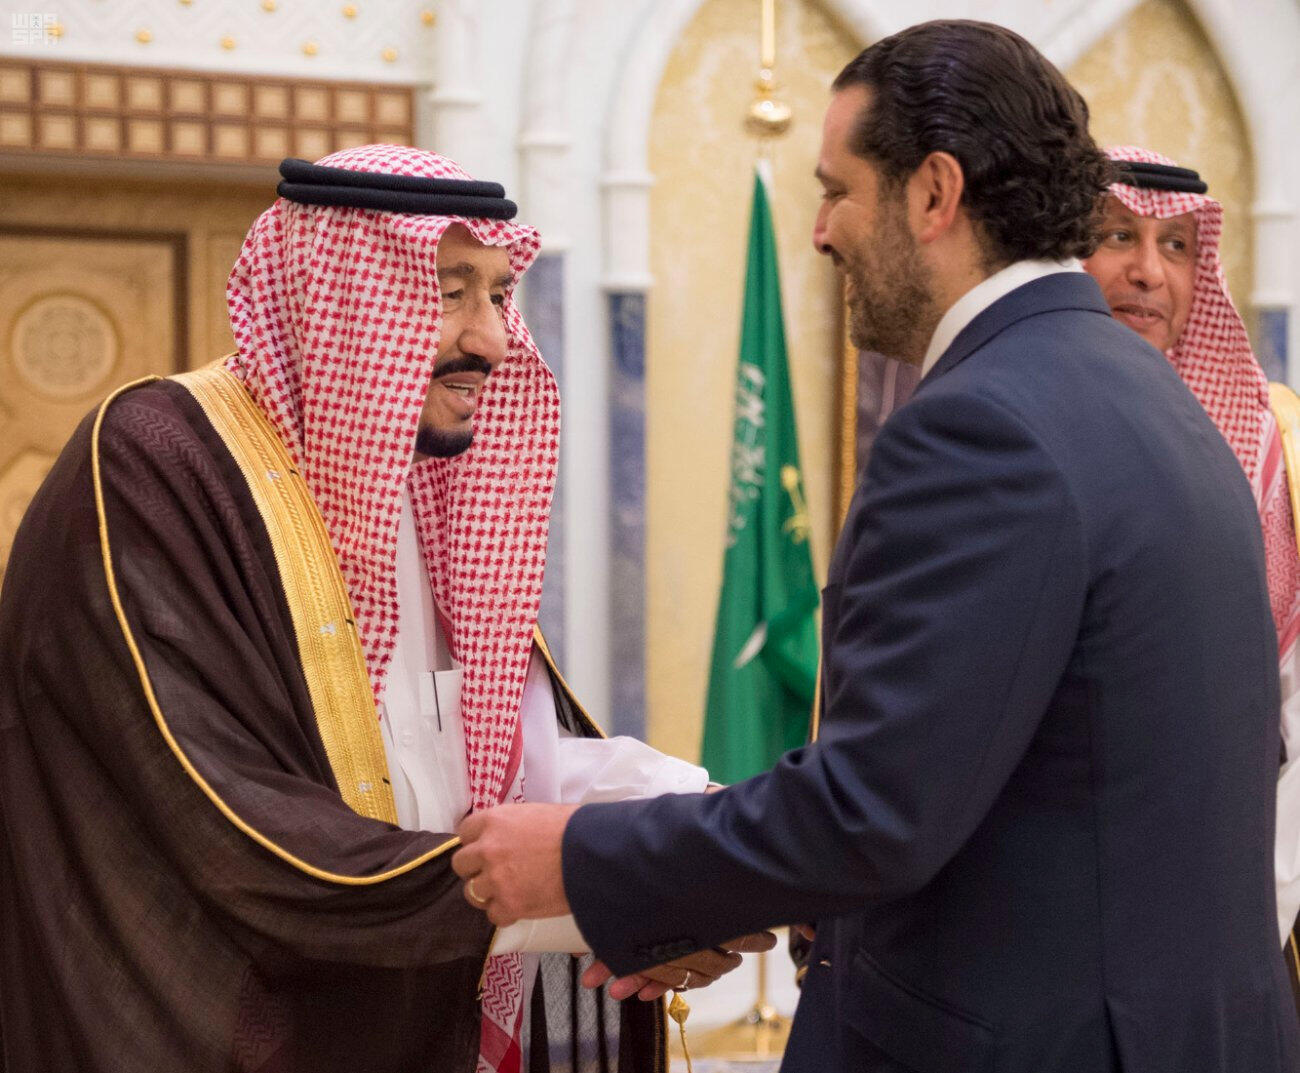 Saudi king Salman ben Abdelaziz al-Saoud meets with outgoing Lebanese Prime Minister Saad Hariri in Riyad, 6 November 2017